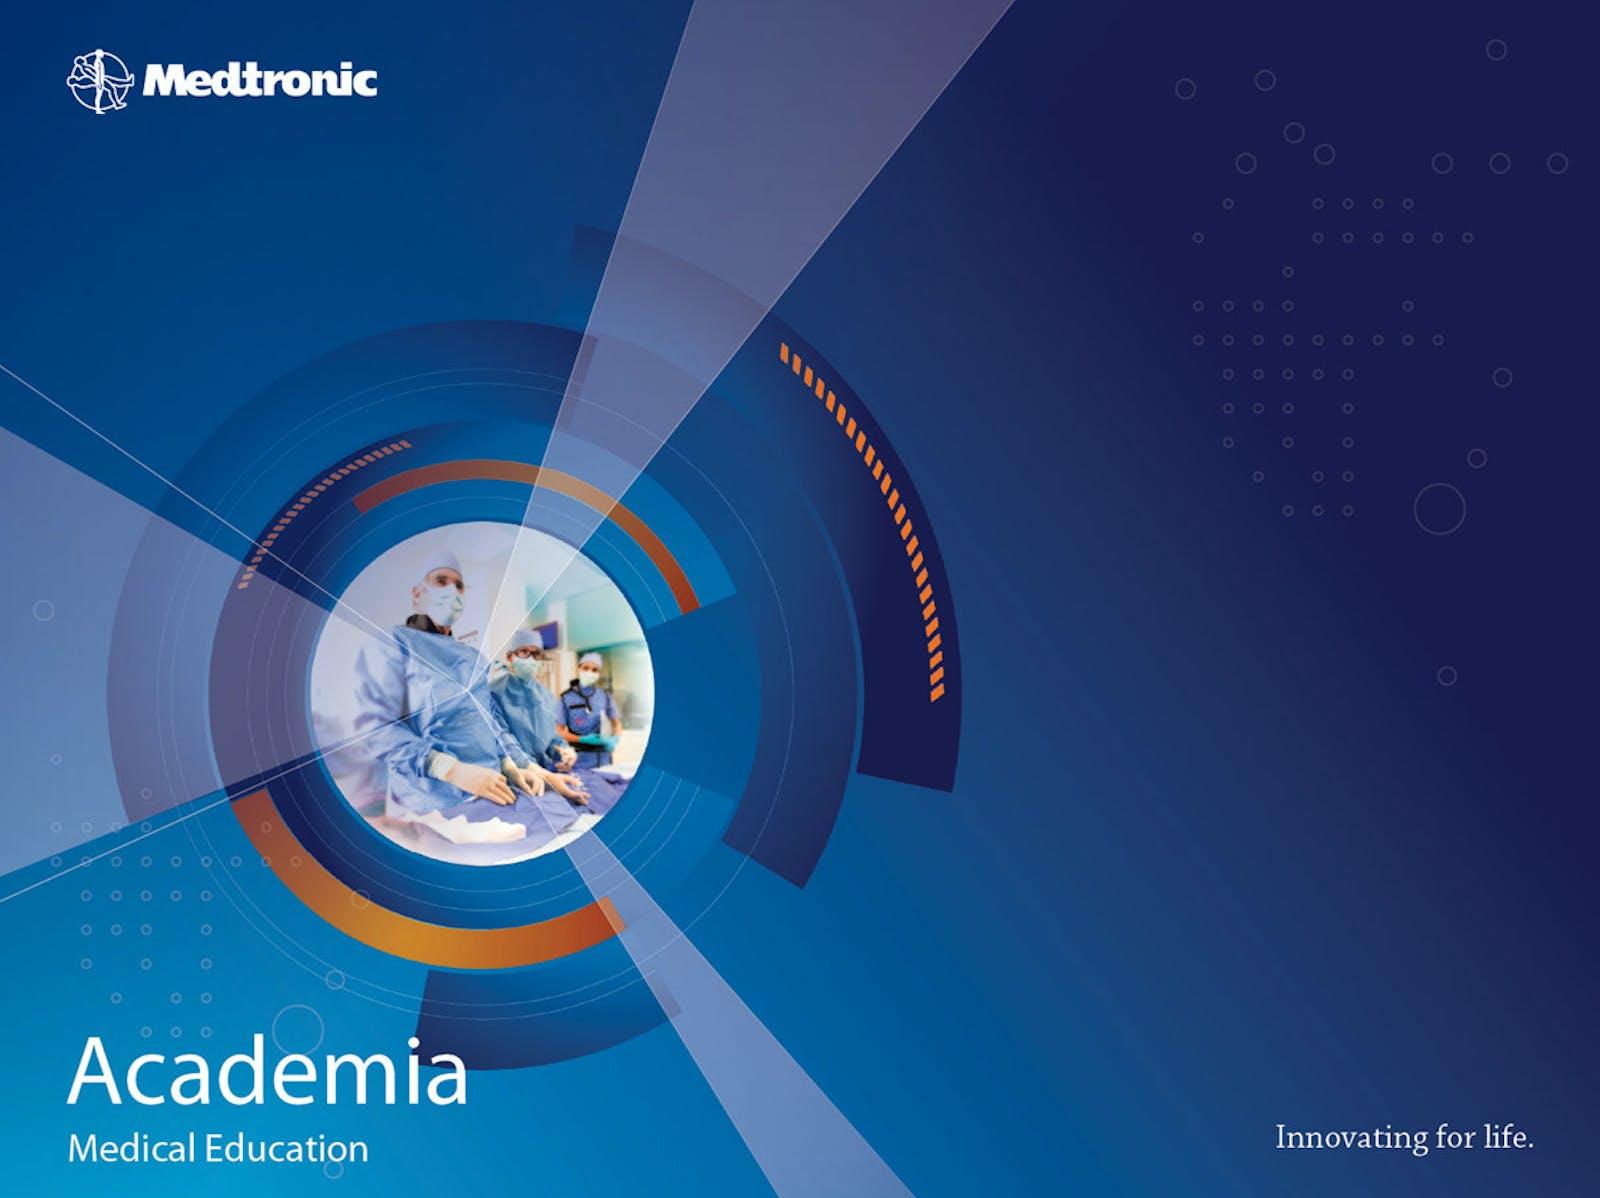 Revamping Medtronic presentations